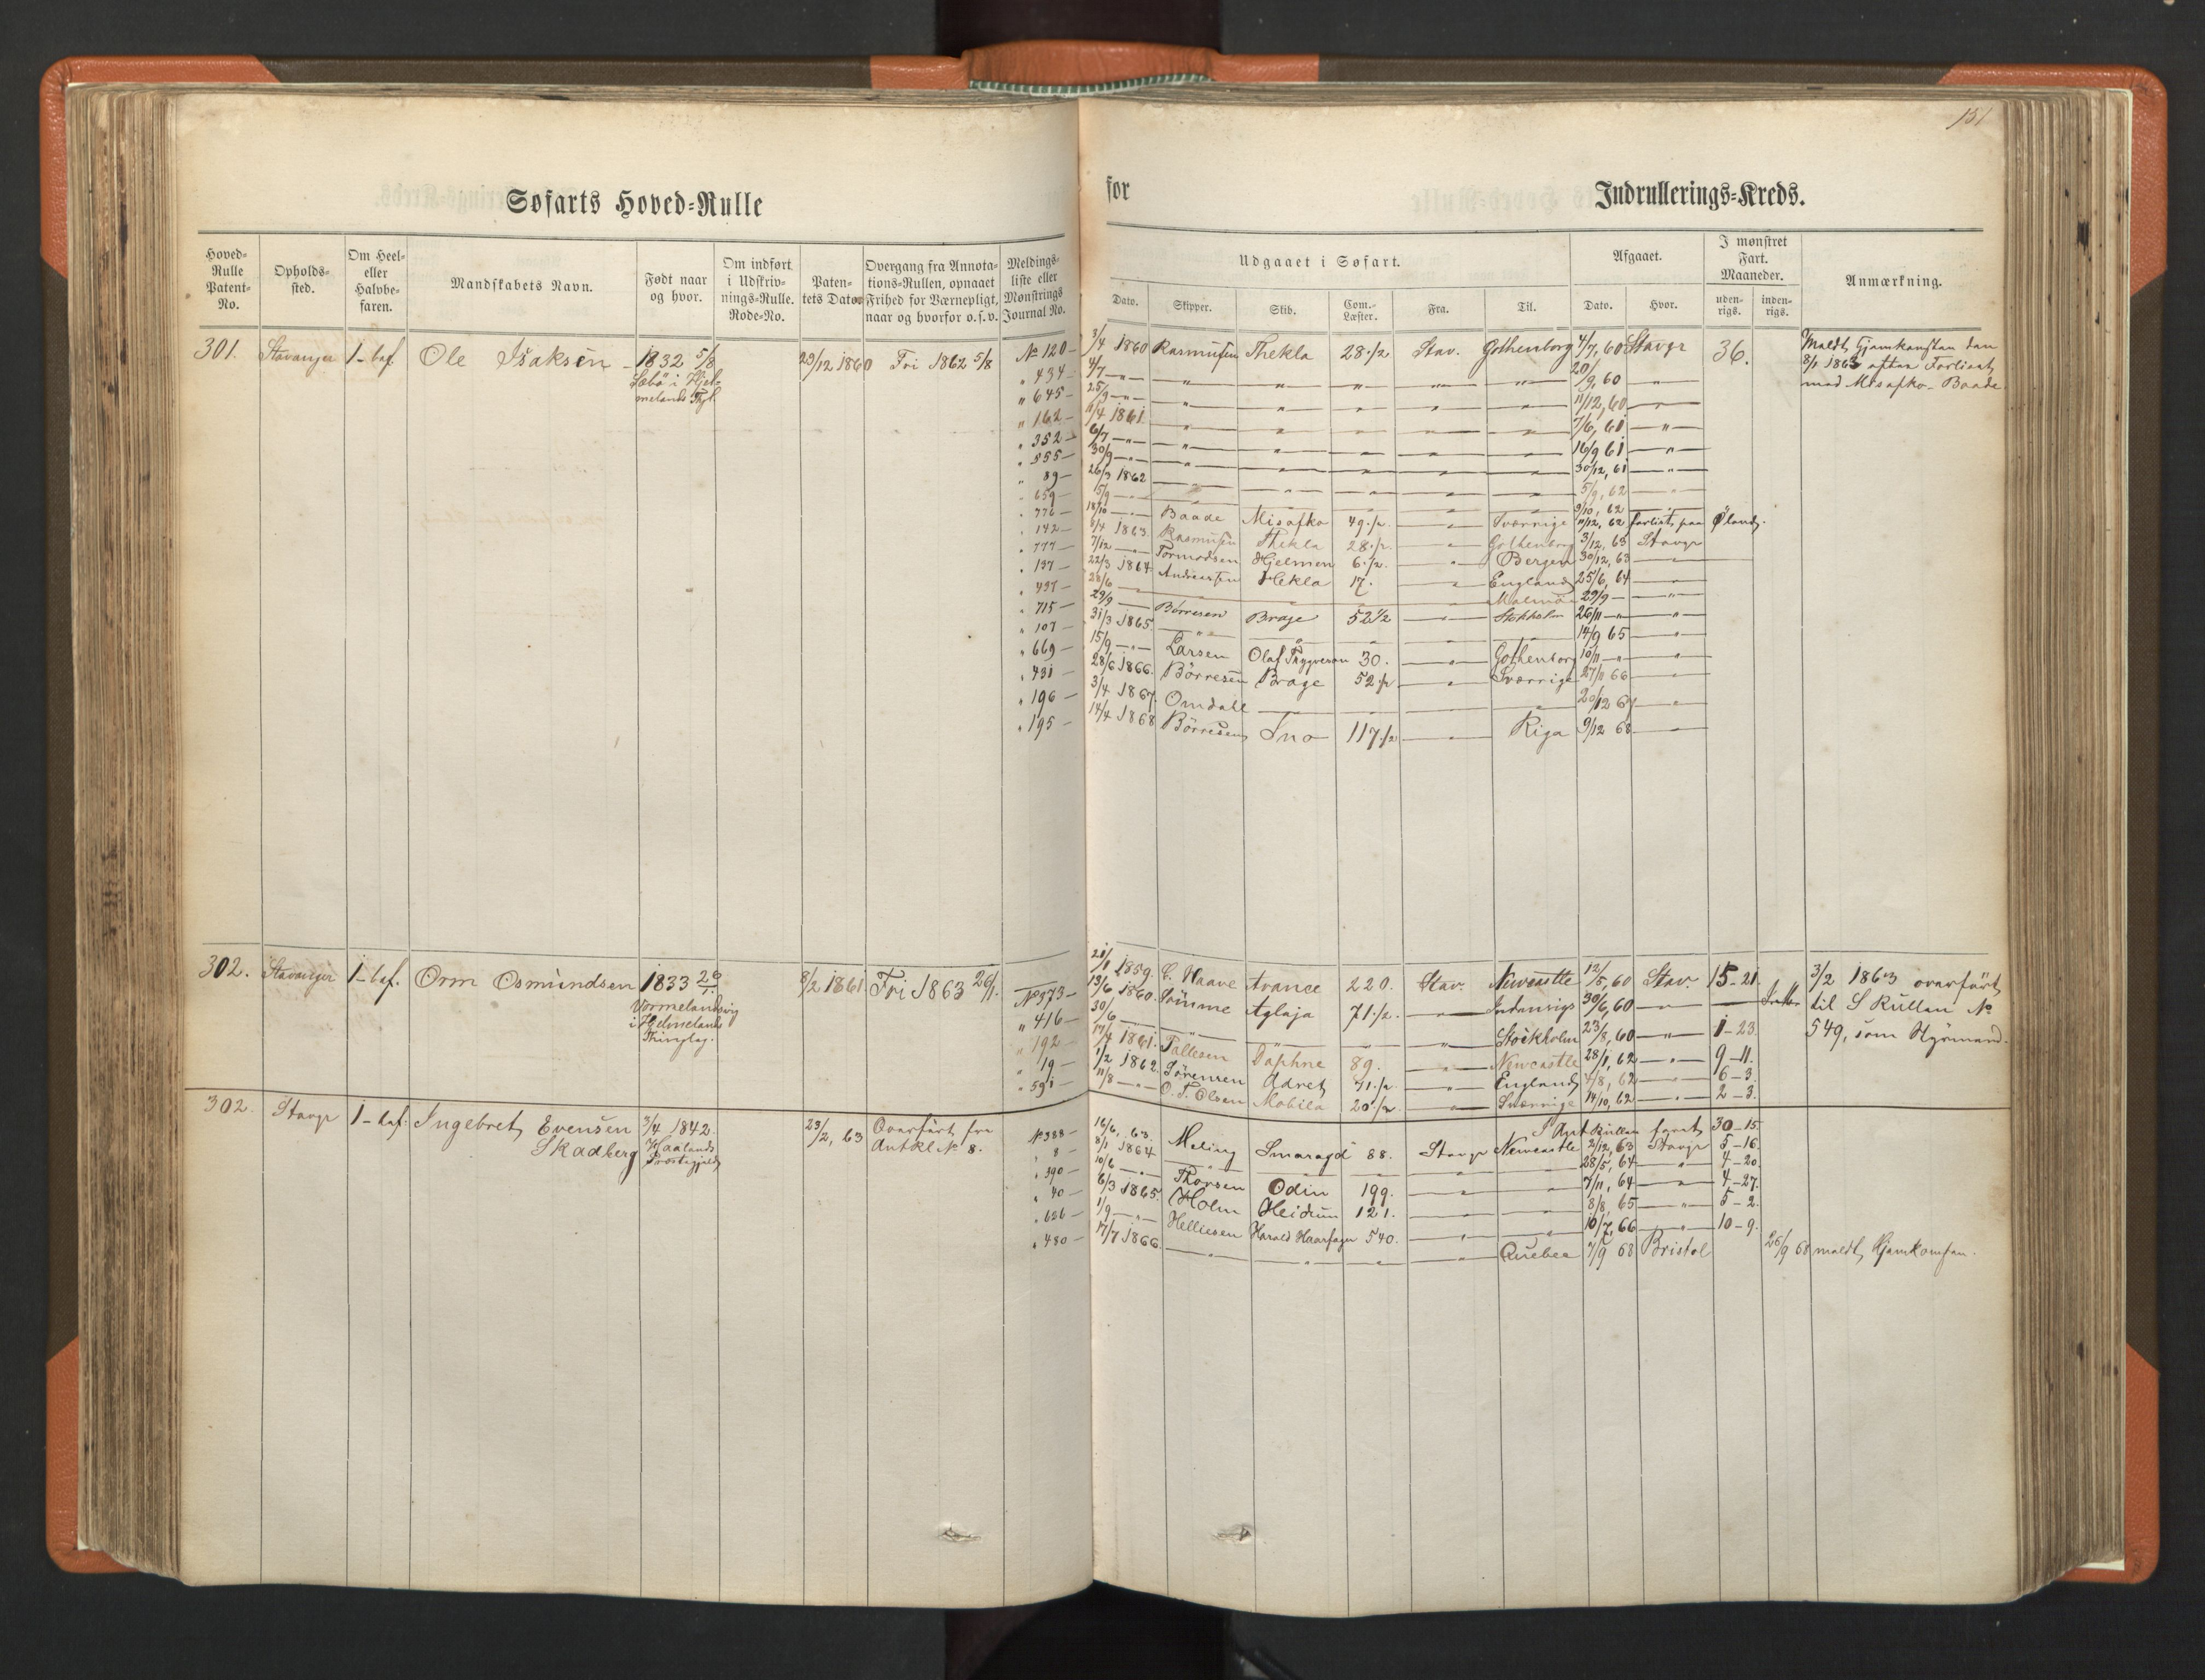 SAST, Stavanger sjømannskontor, F/Fb/Fbb/L0001: Sjøfartshovedrulle, patentnr. 1-720 (del 1), 1860-1863, p. 155